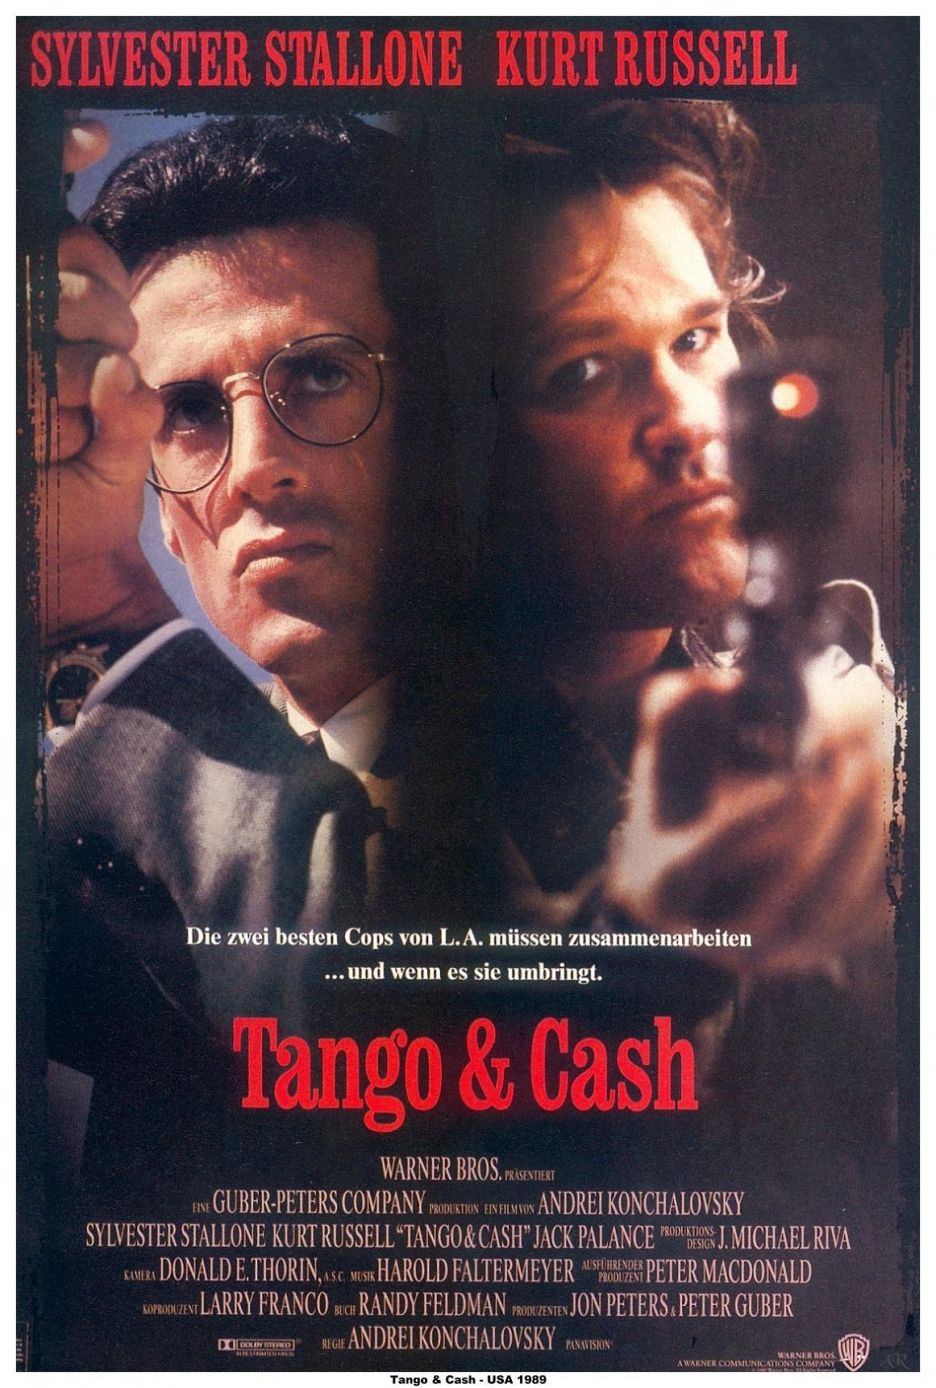 tango cash 1989 albert magnoli andr i konchalovski movies tv stuff pinterest. Black Bedroom Furniture Sets. Home Design Ideas